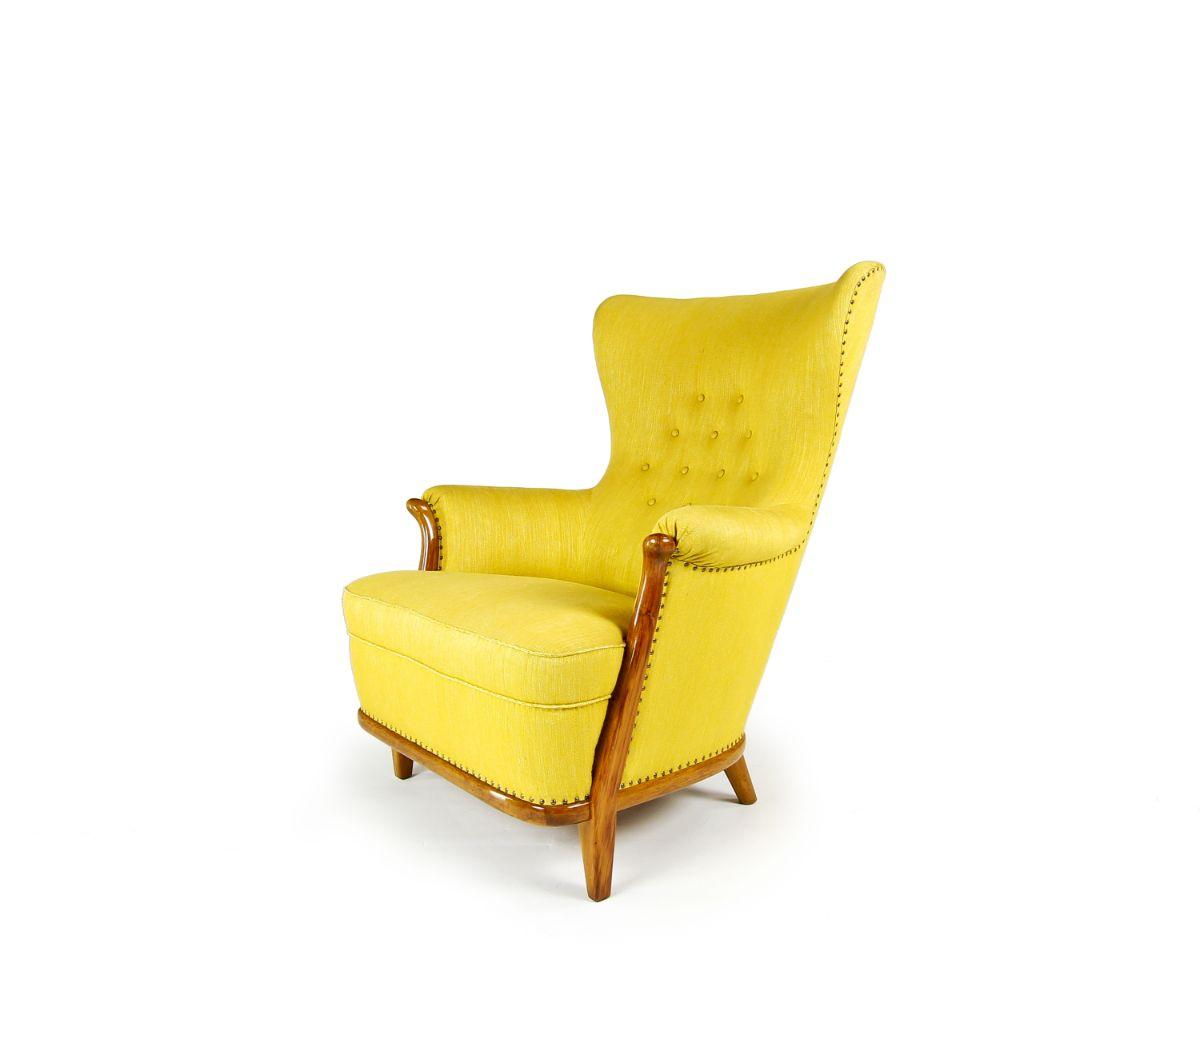 mid century modern furniture Swedish chair yellow wool 1950's